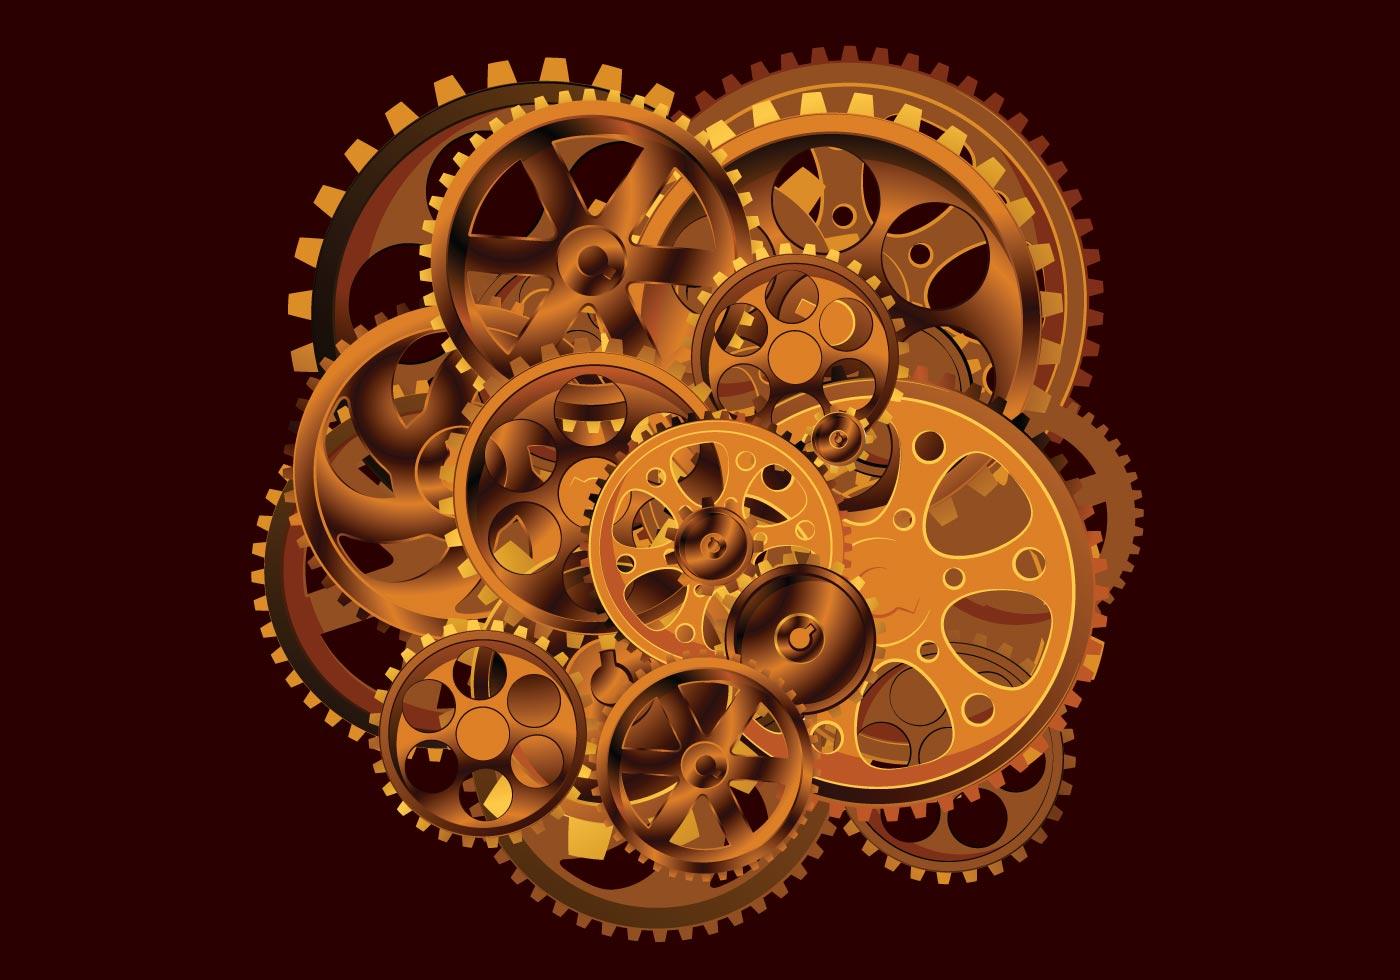 free vector gears free vector art at vecteezy gear vector in dreams meaning gear vector image